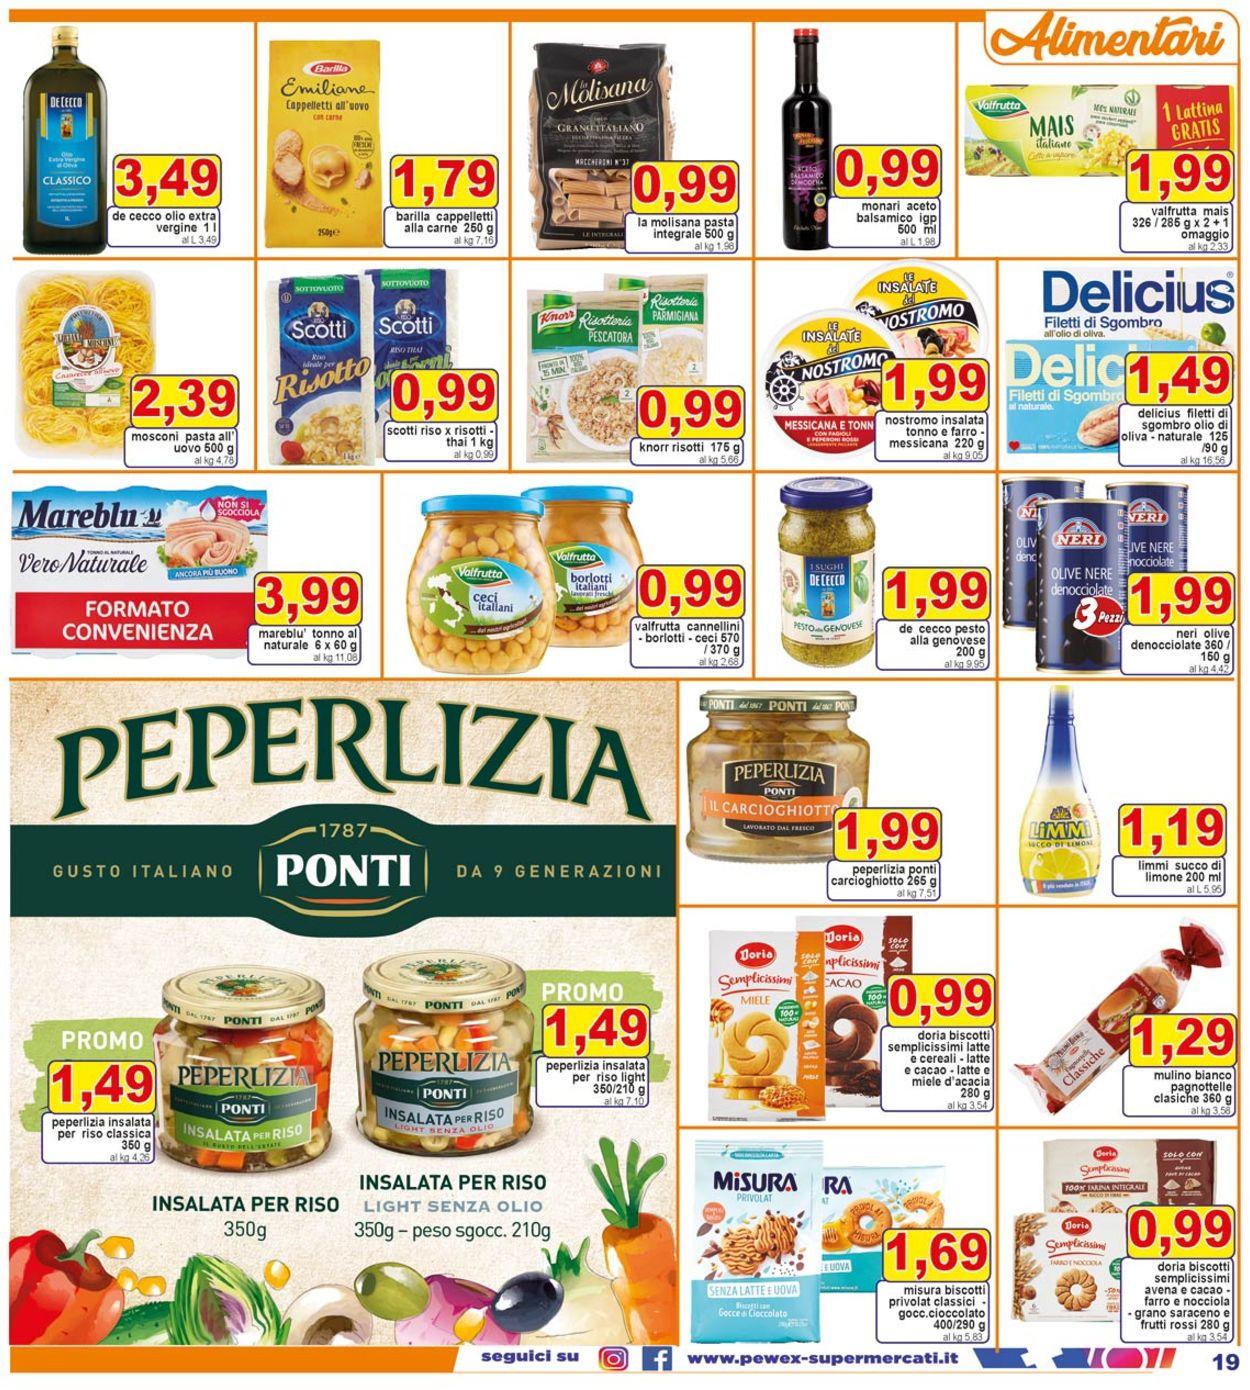 Volantino Pewex - Offerte 28/05-08/06/2021 (Pagina 19)